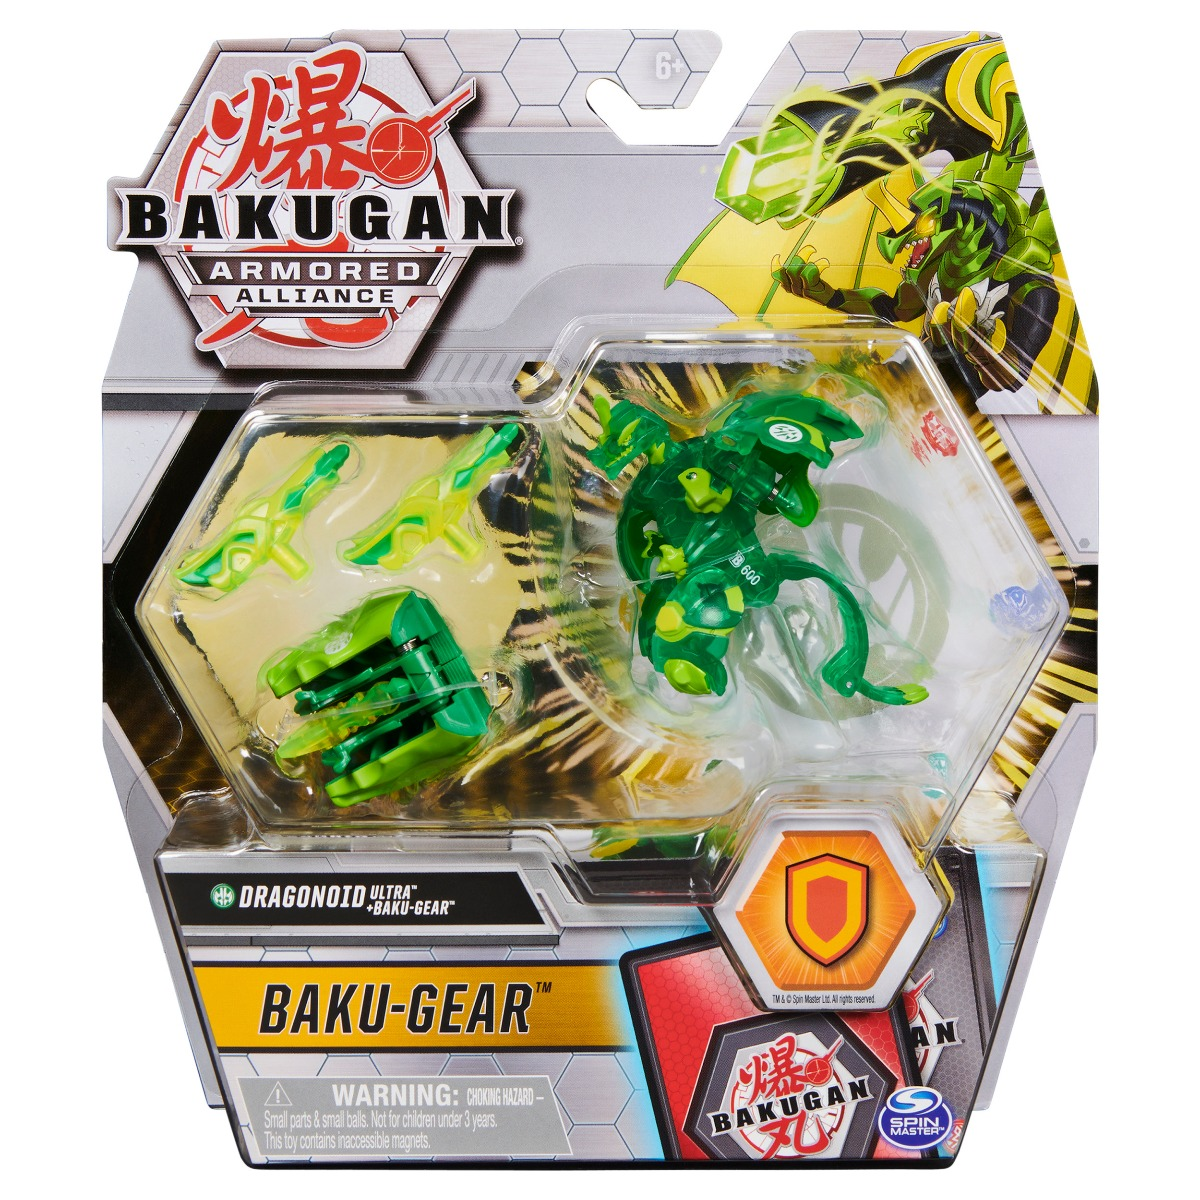 Figurina Bakugan Armored Alliance, Dragonoid Ultra, Baku-Gear 20124766